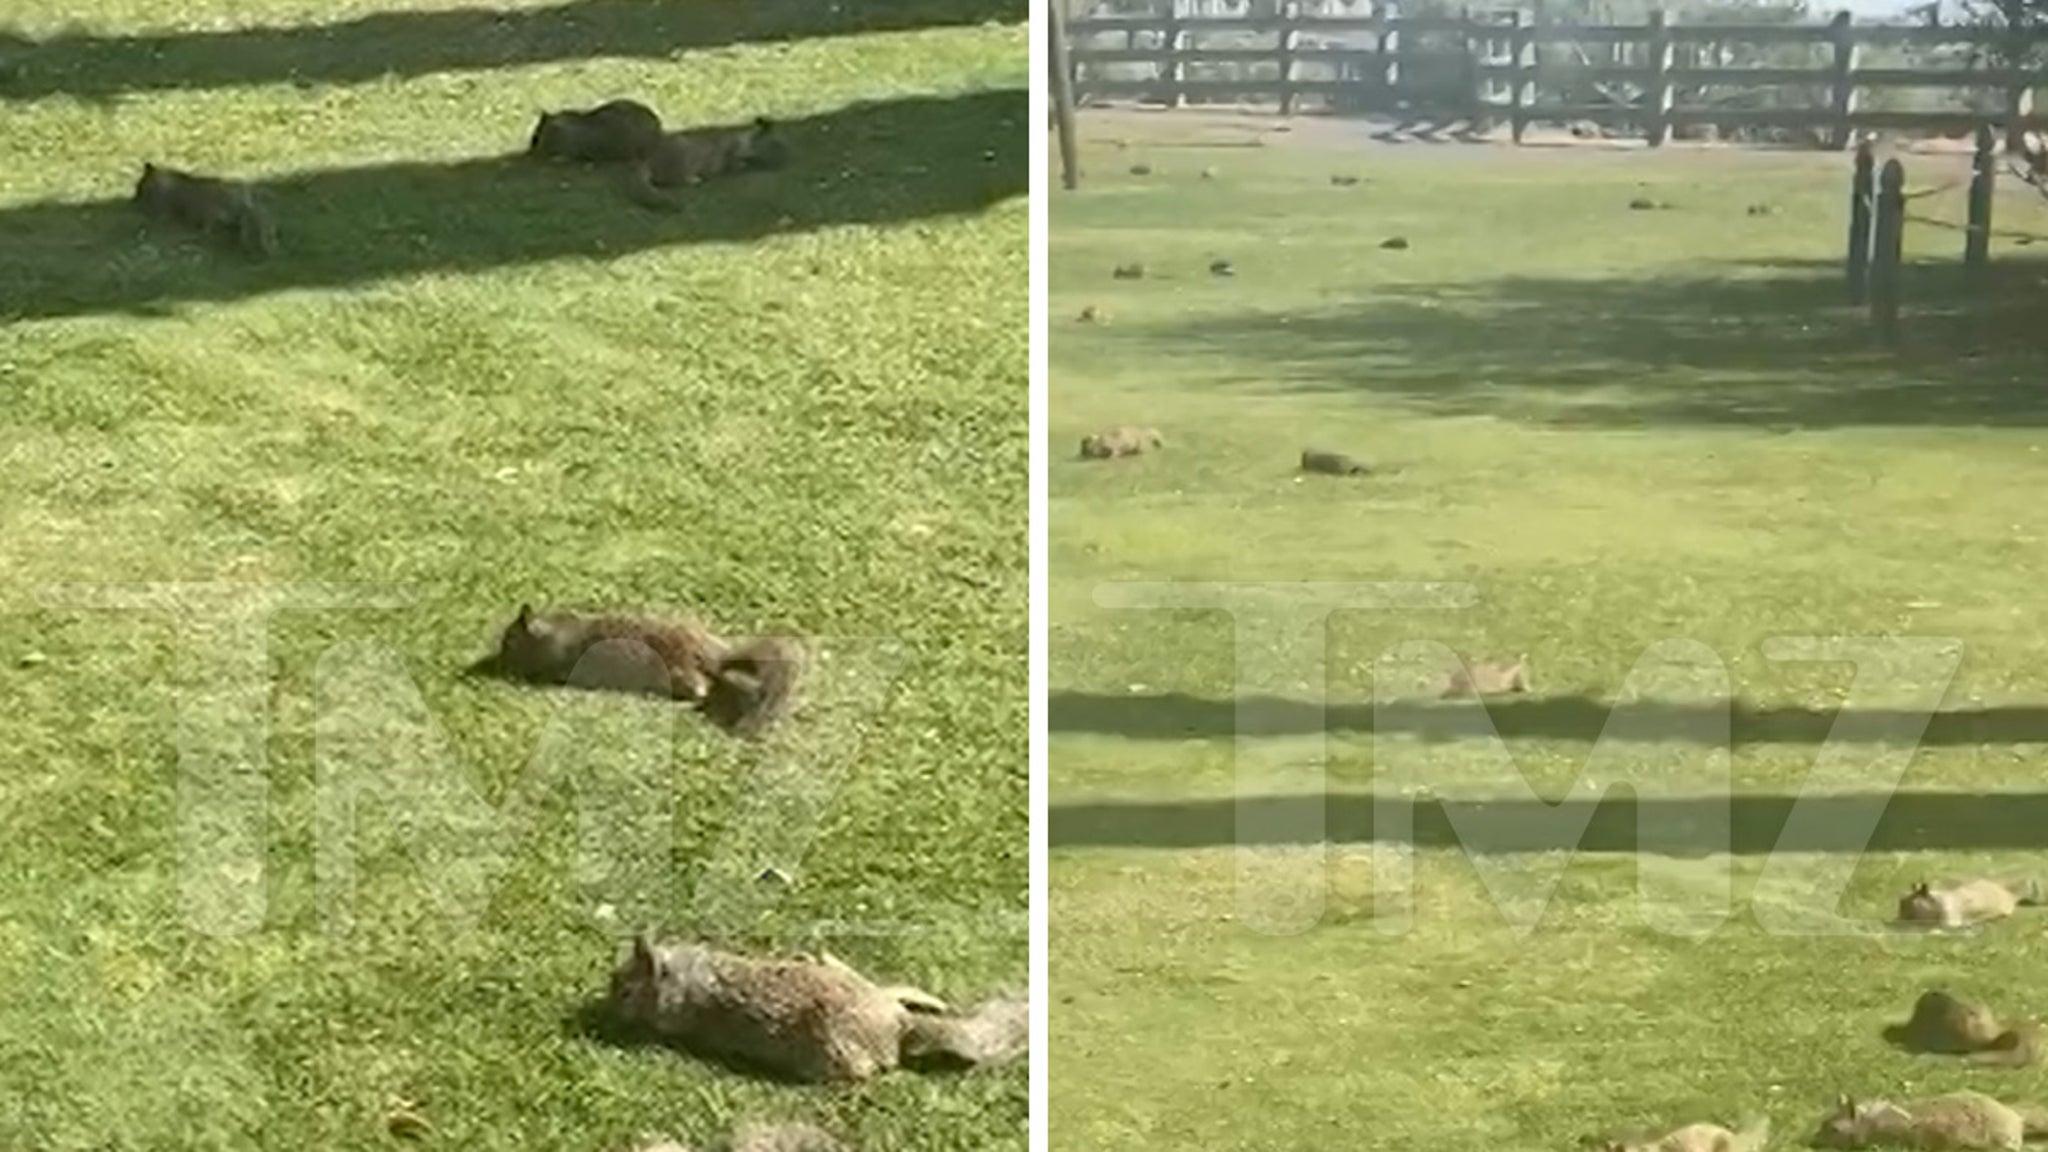 Squirrels Take Over Park in Santa Monica During California Lockdown